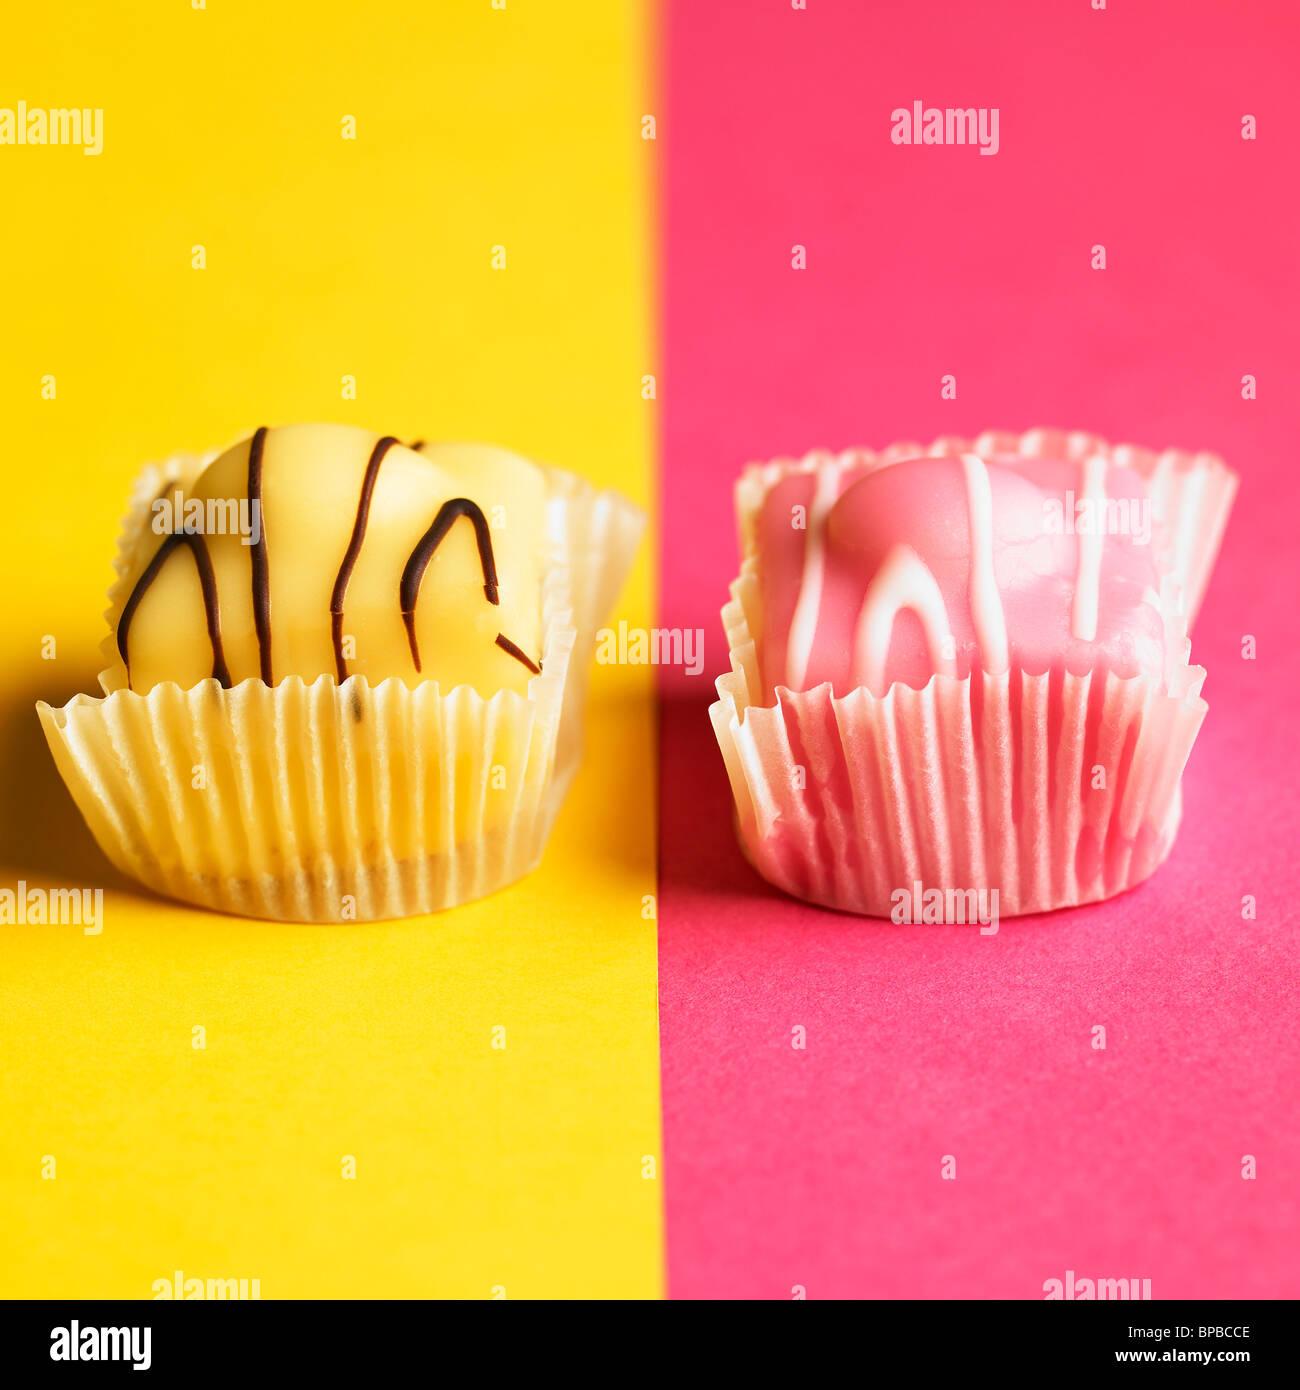 yellow-and-pink-fondant-fancies-on-yello